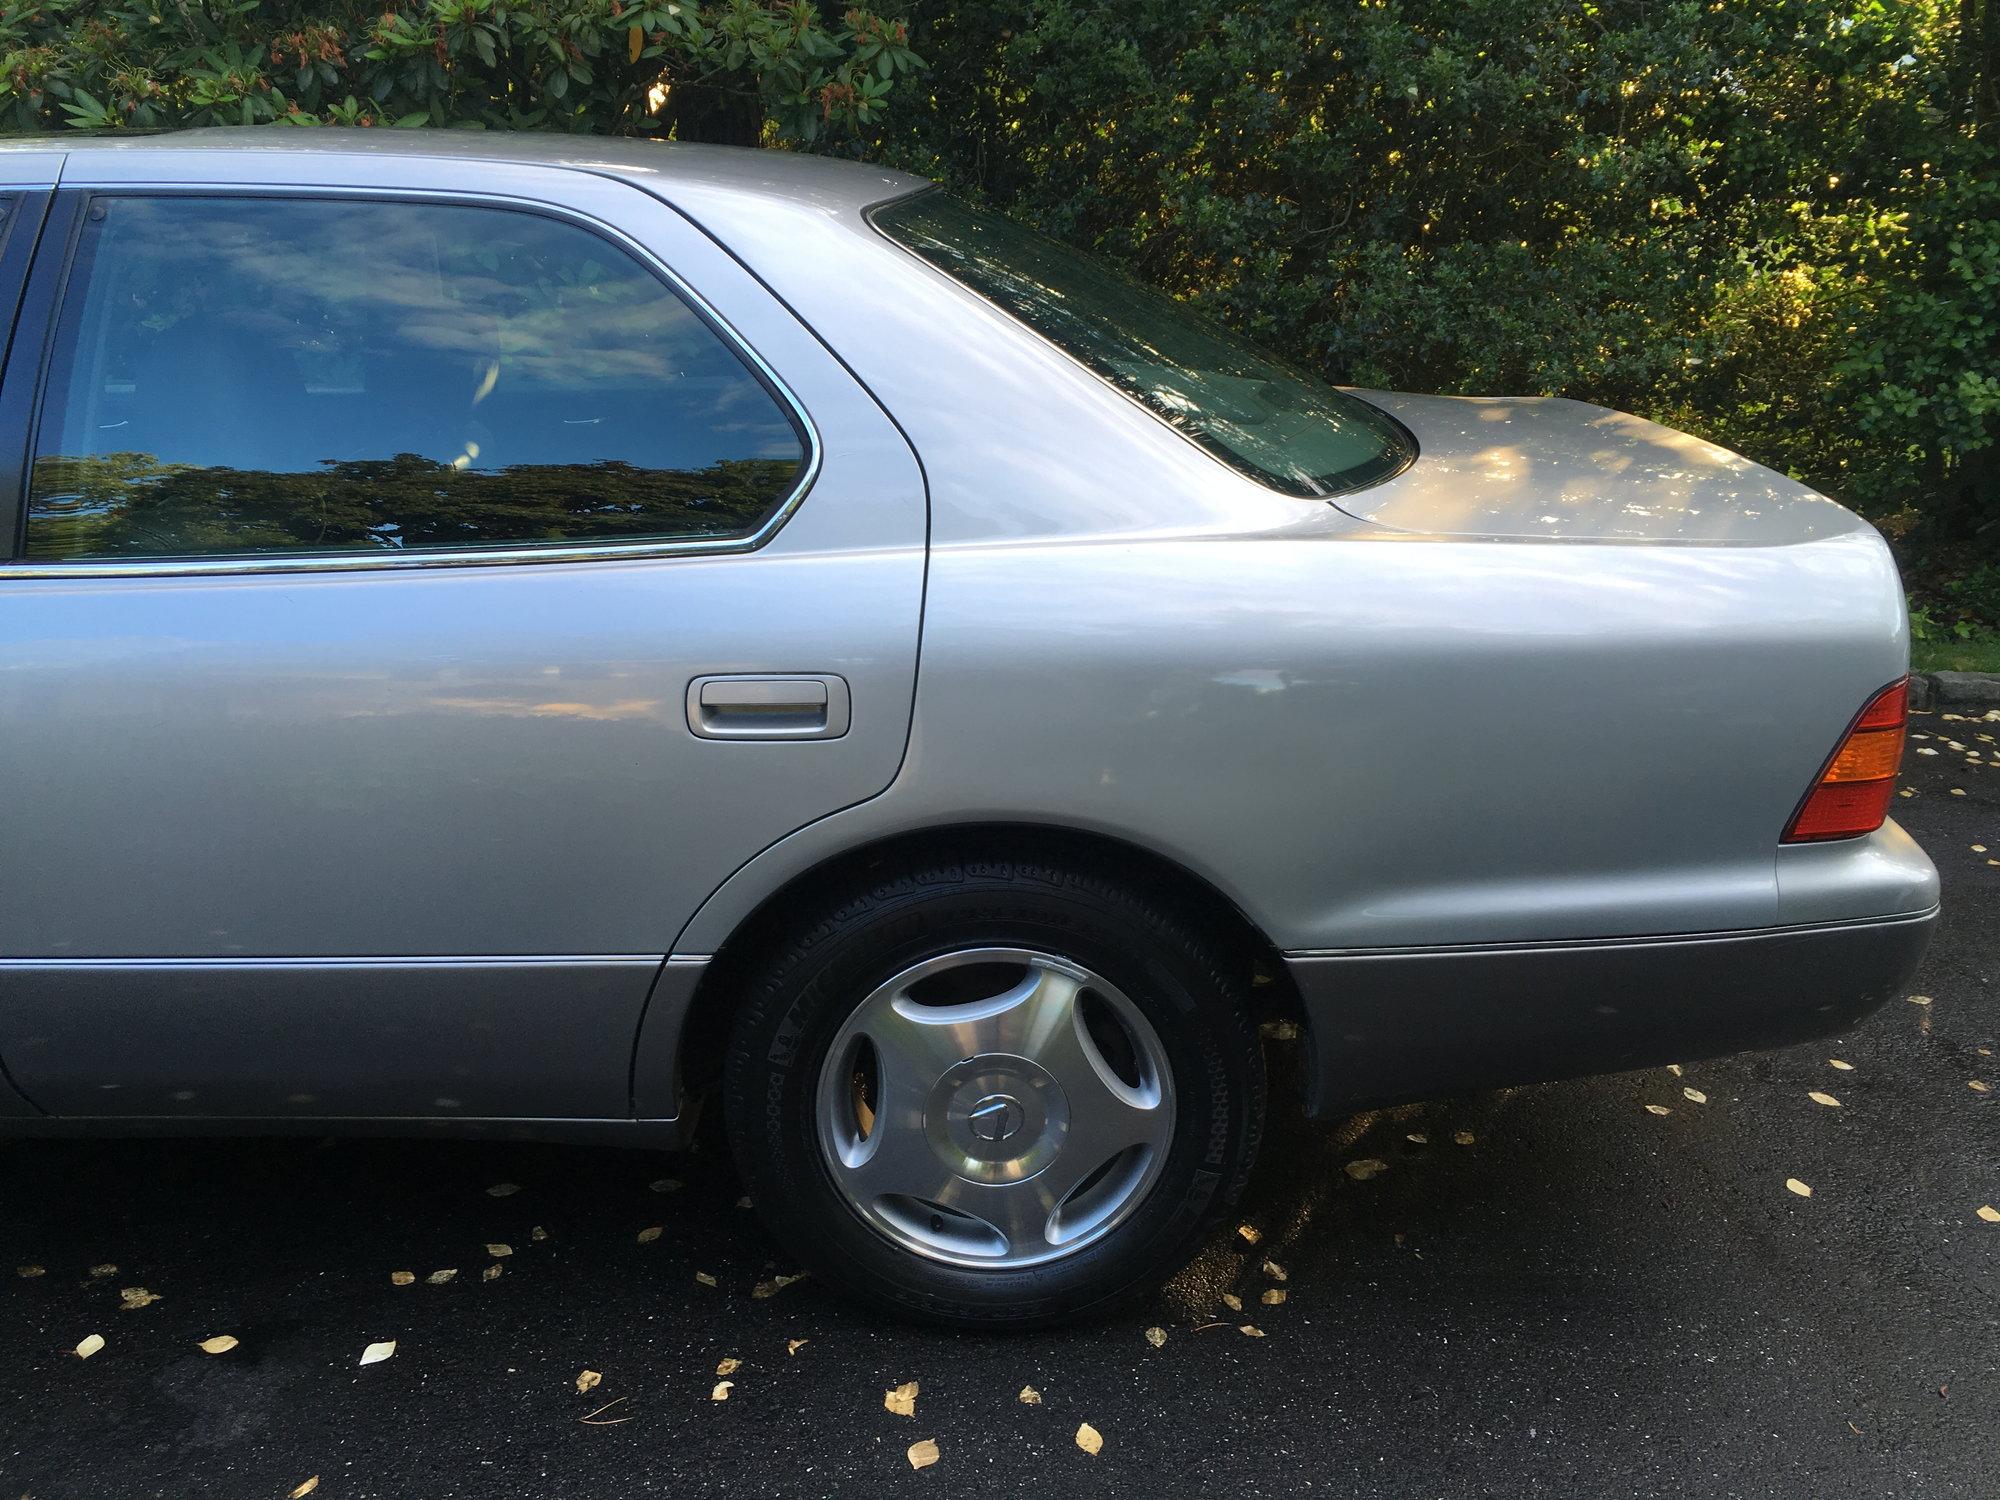 Oem Wheel Options For My 99 Ls400 Clublexus Lexus Forum Discussion